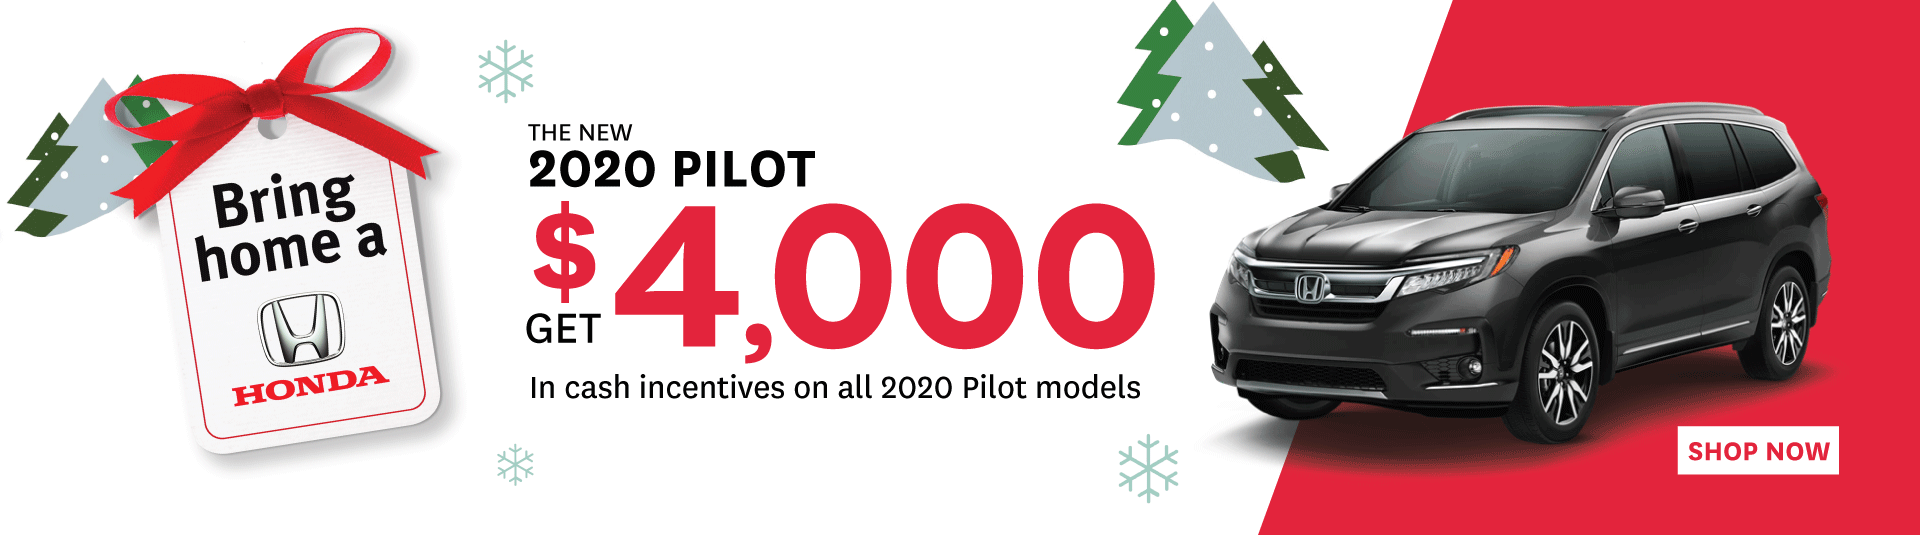 2020 Honda Pilot - Orangeville Honda